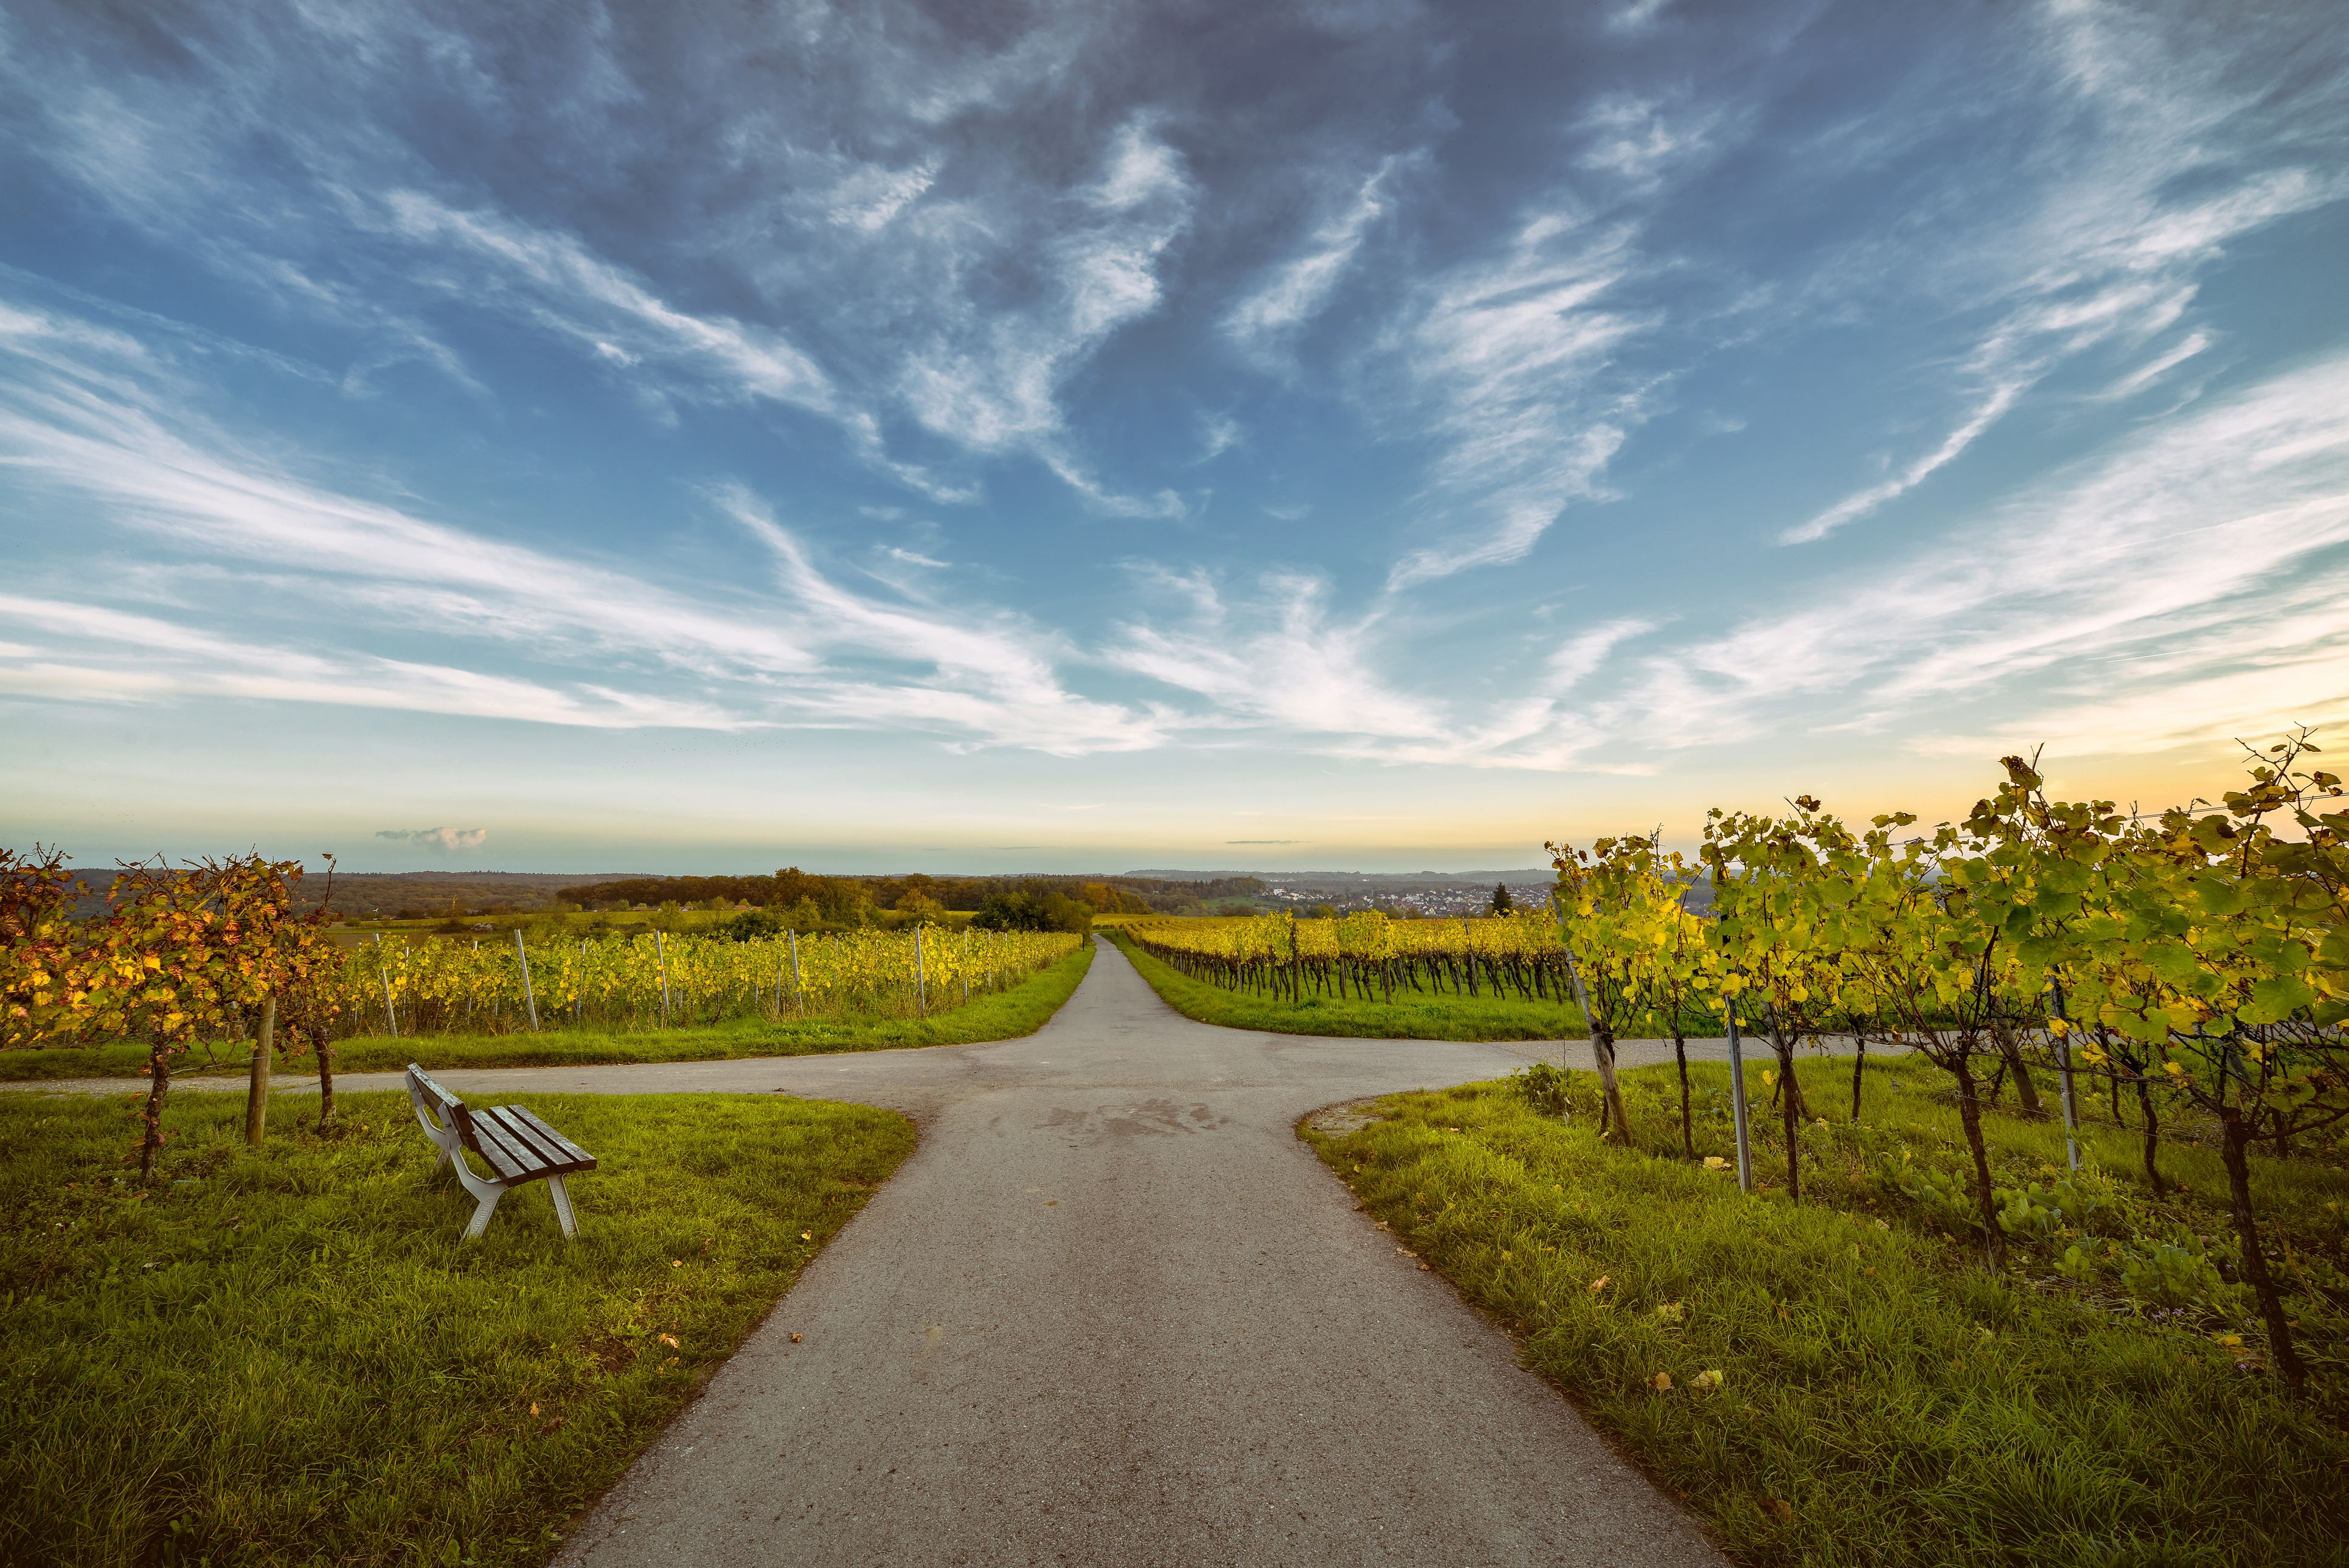 A crossroads